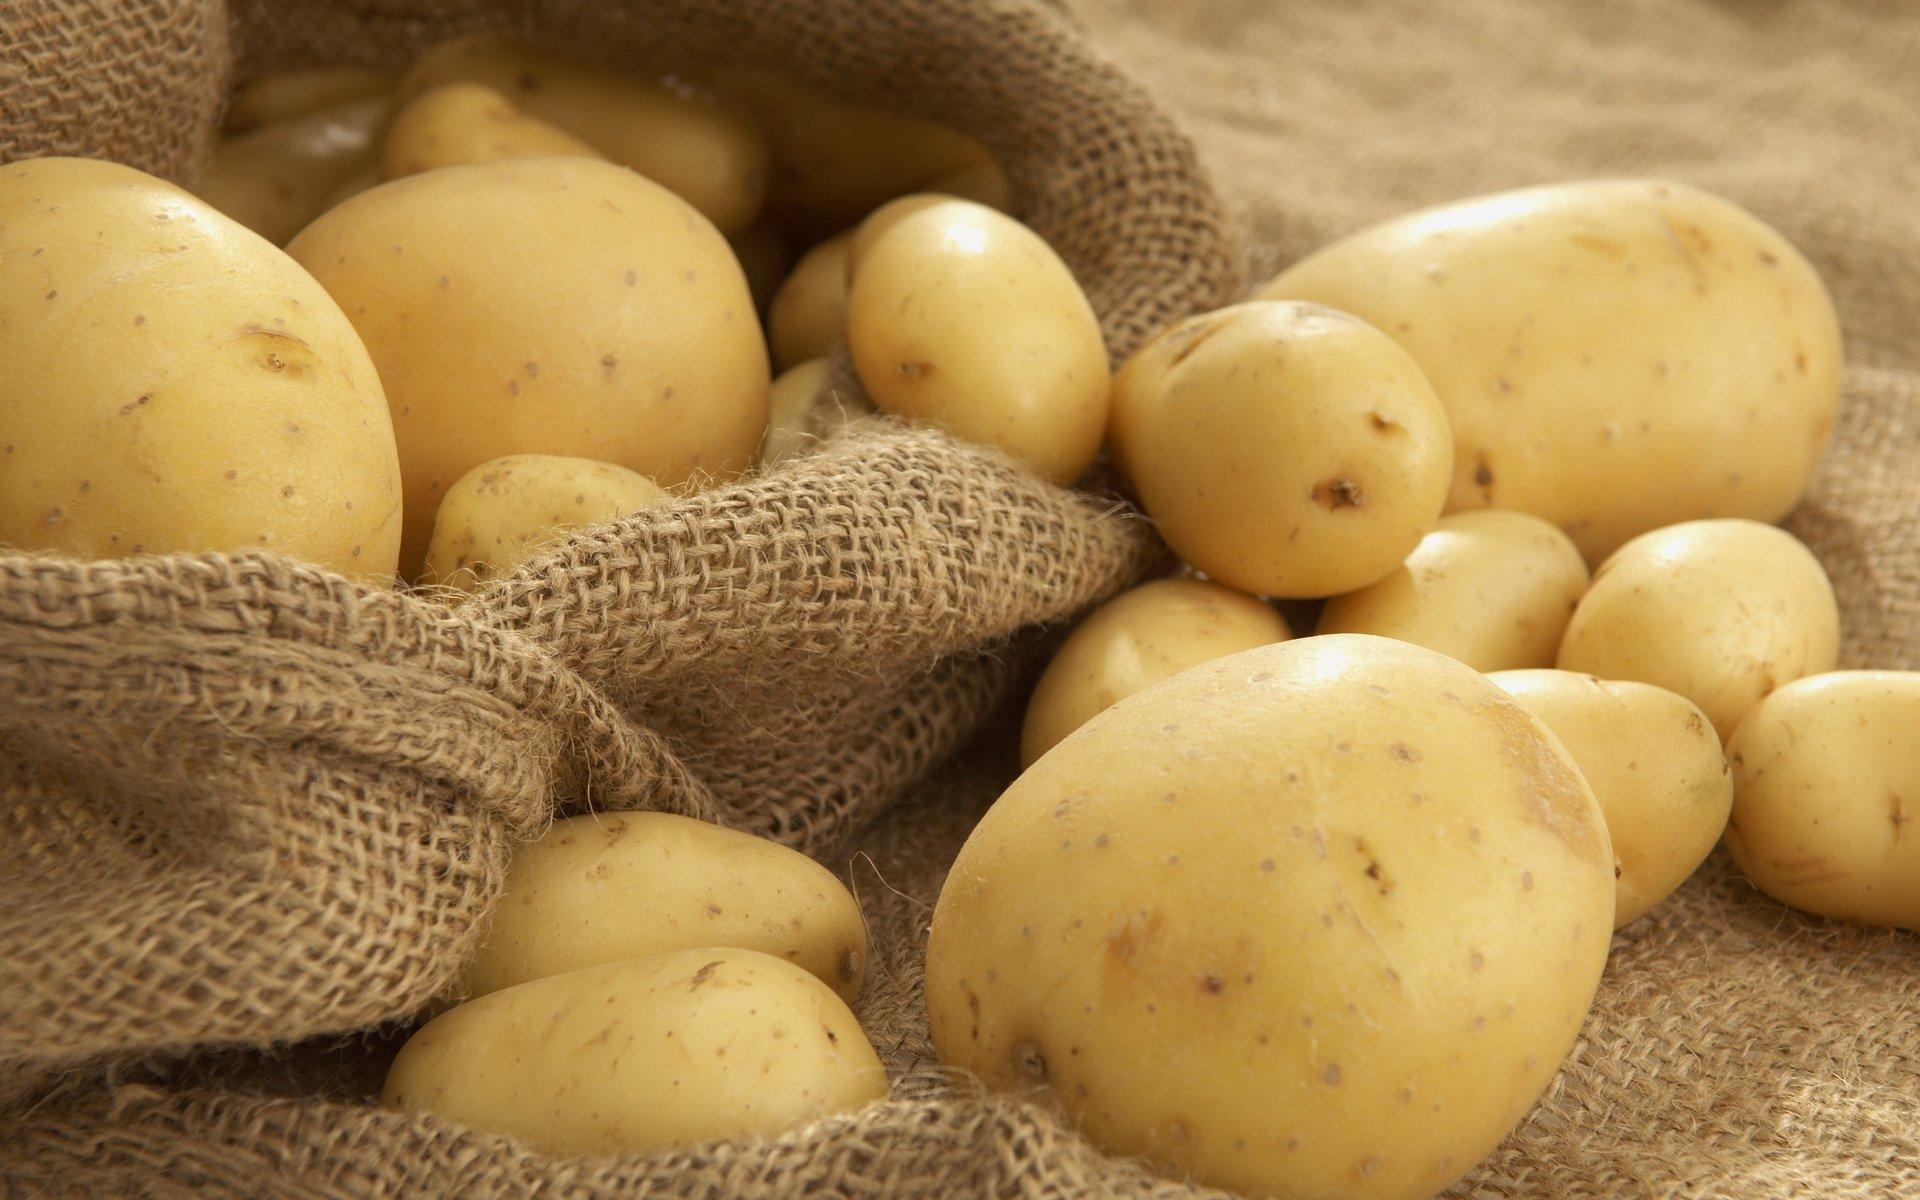 potatoes food wallpaper 63188